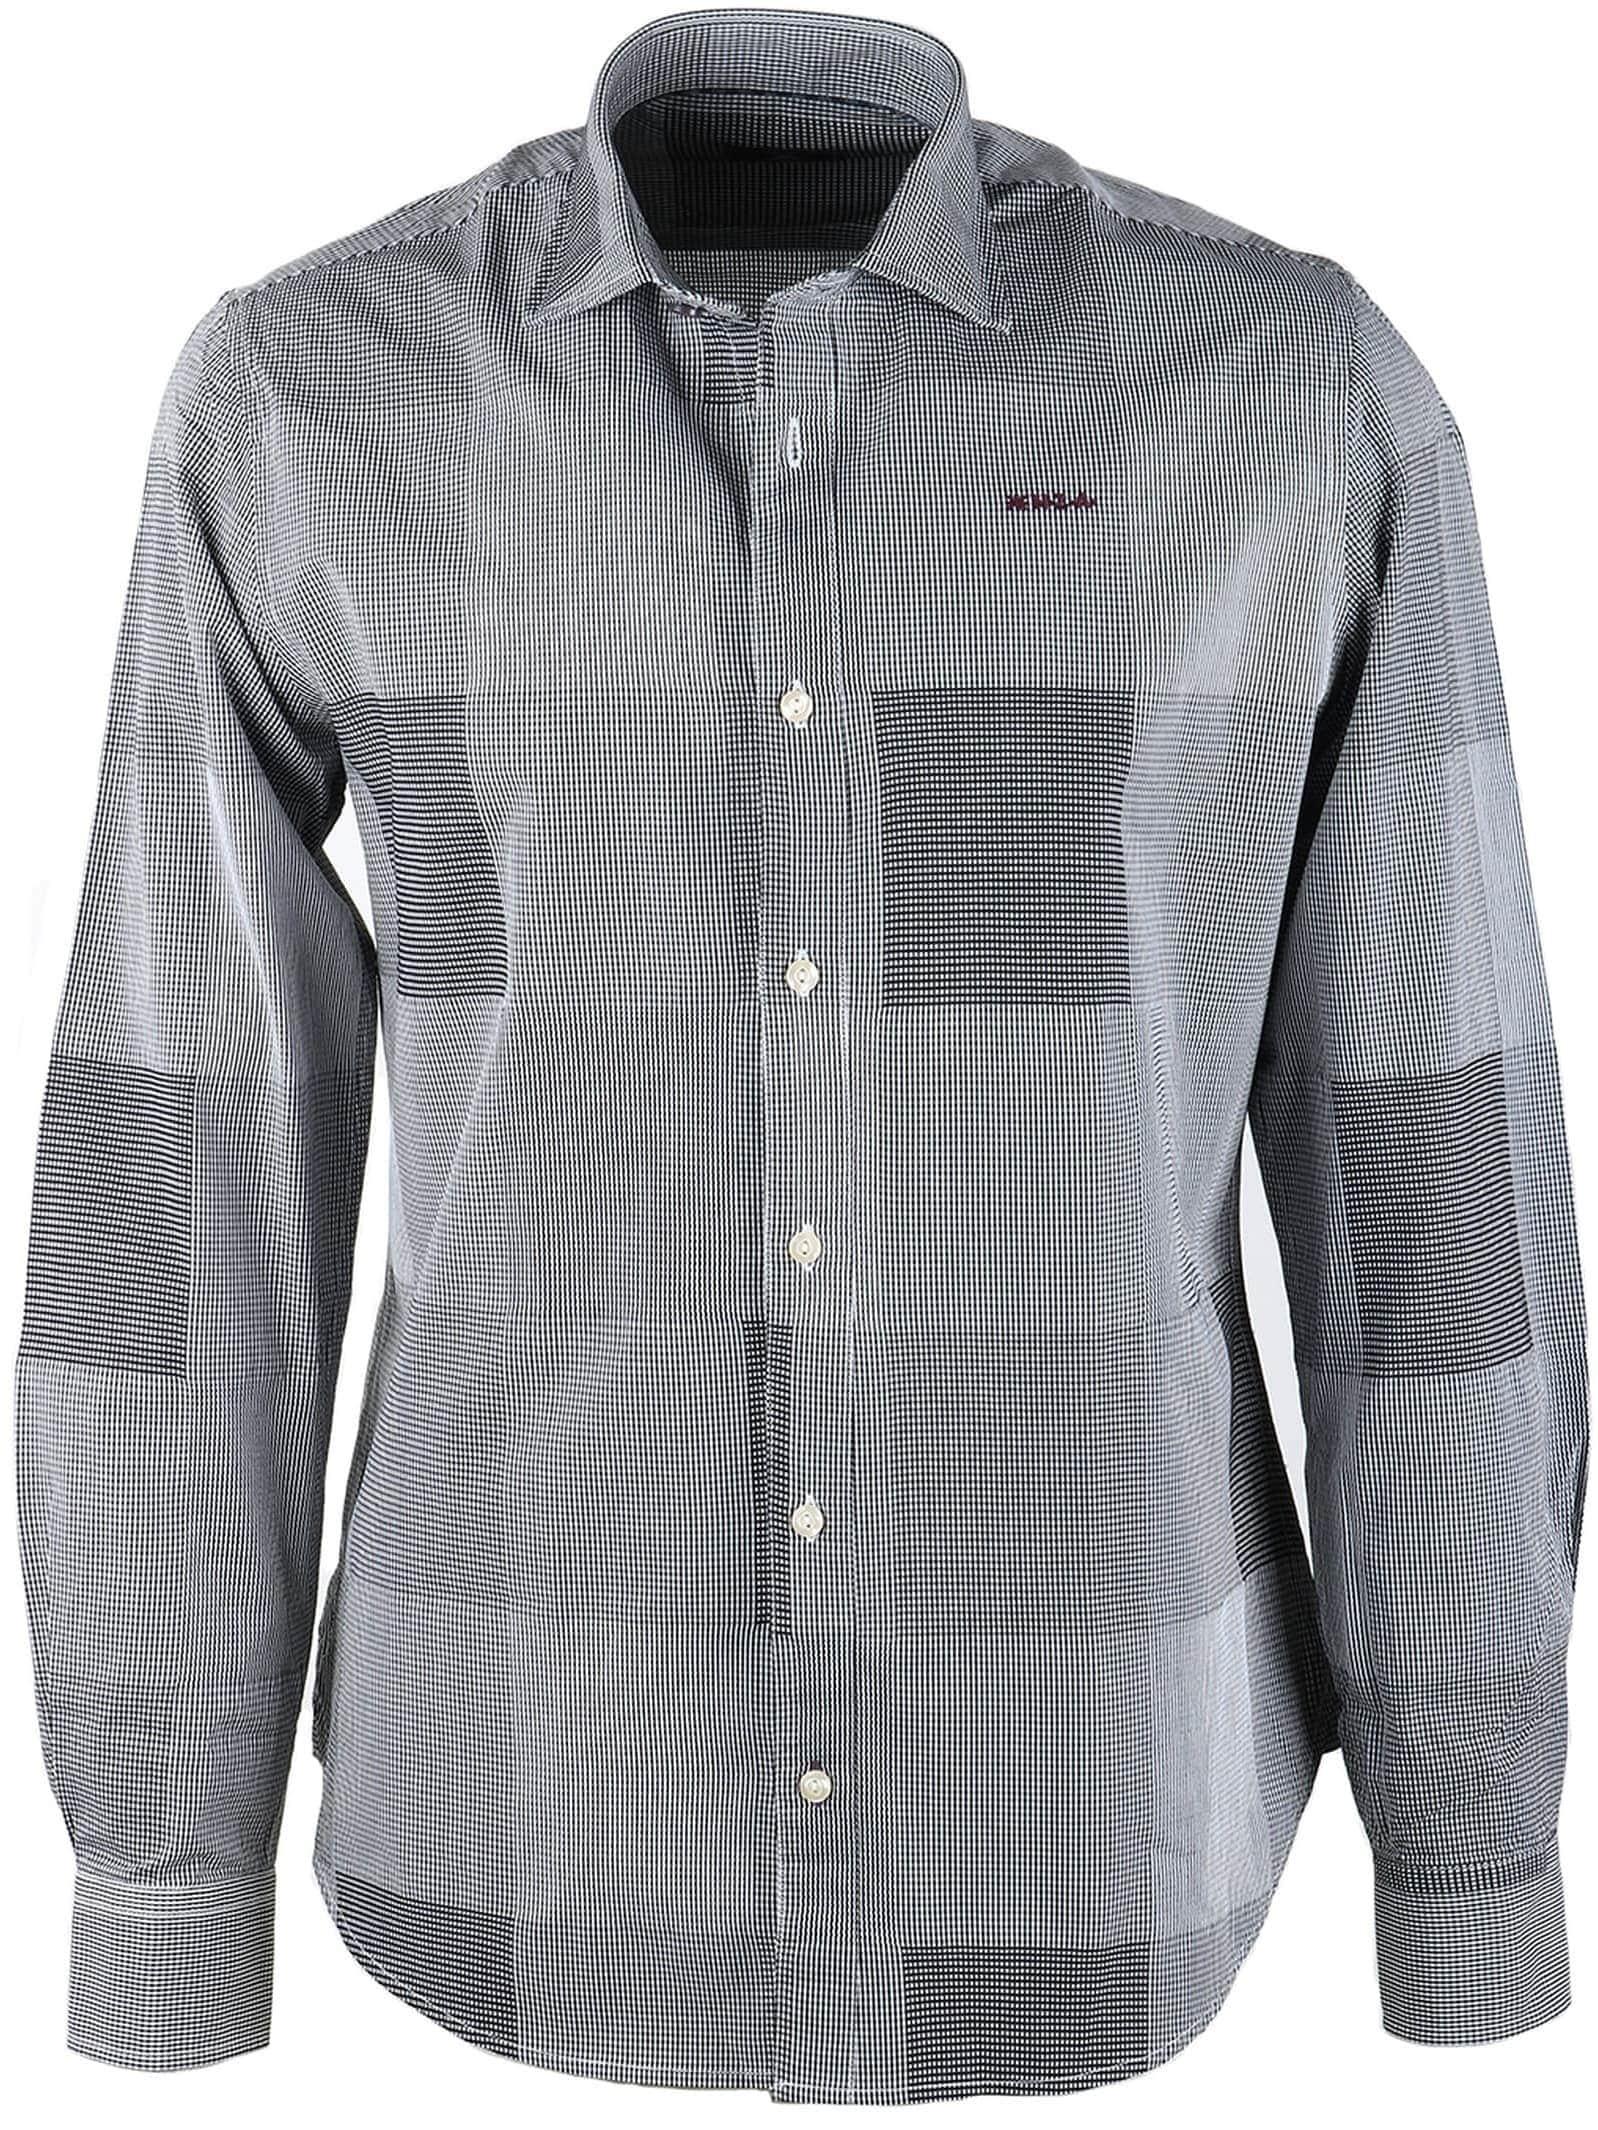 Overhemd Zwart Wit.Nza Overhemd Zwart Wit Ruit 16kn546